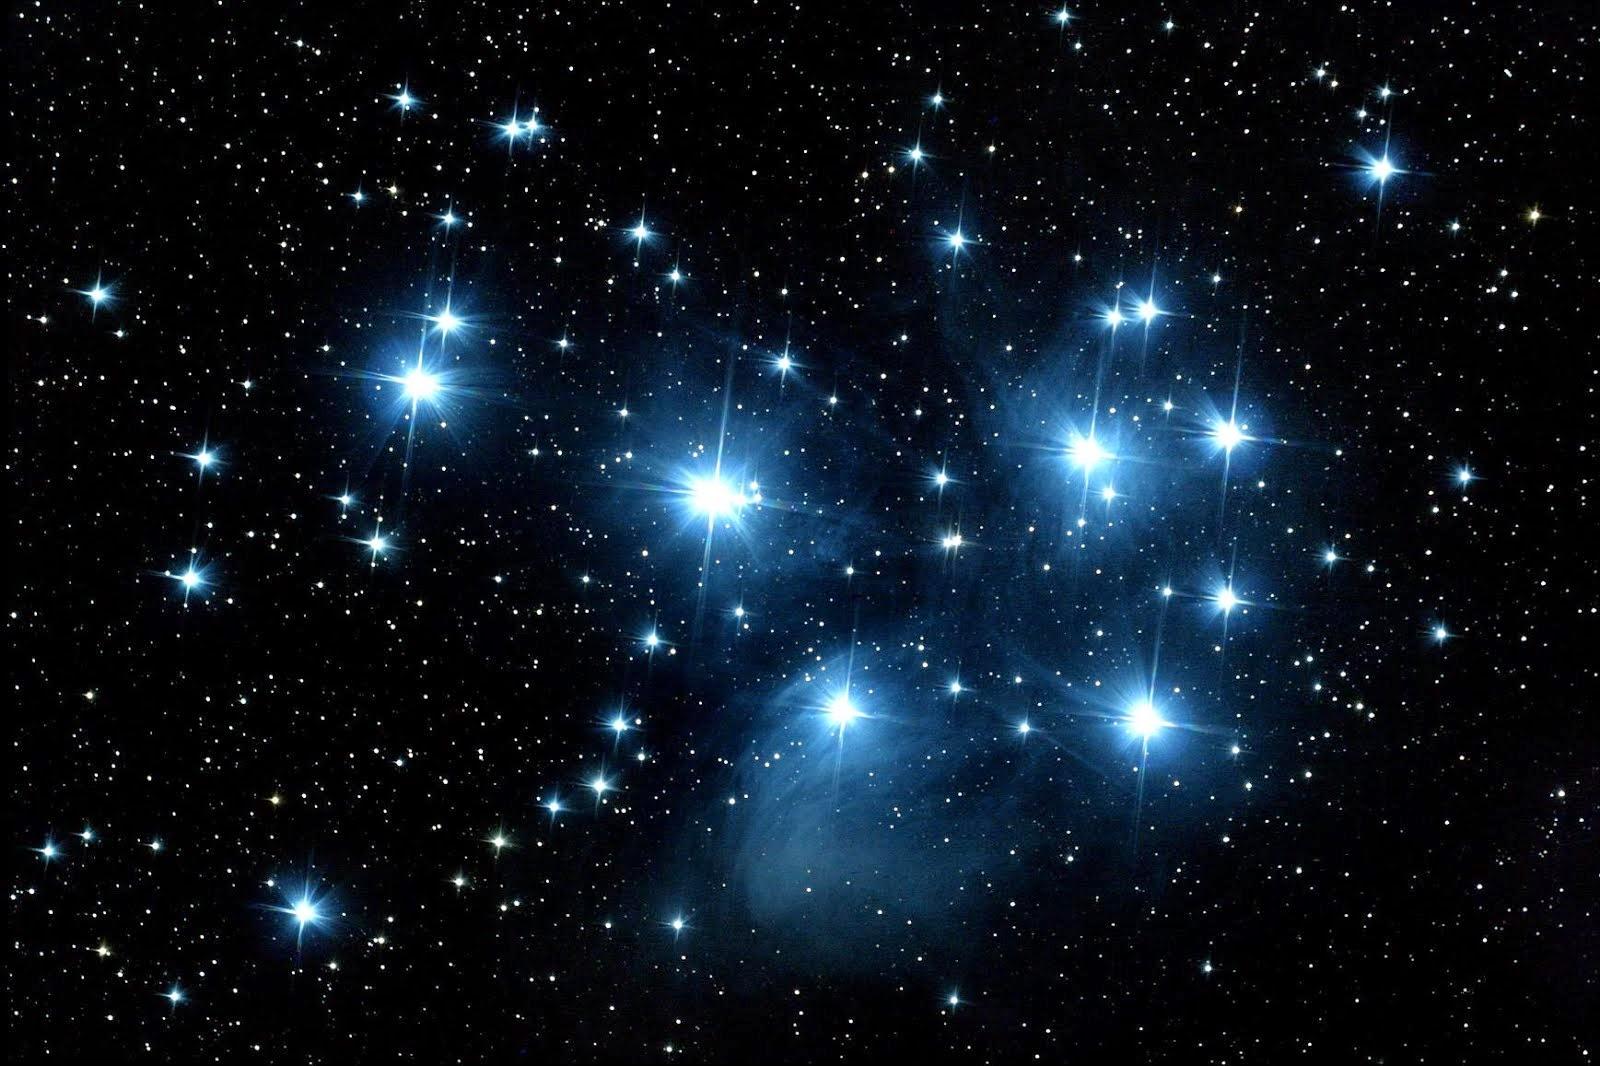 Pleiades (Home)